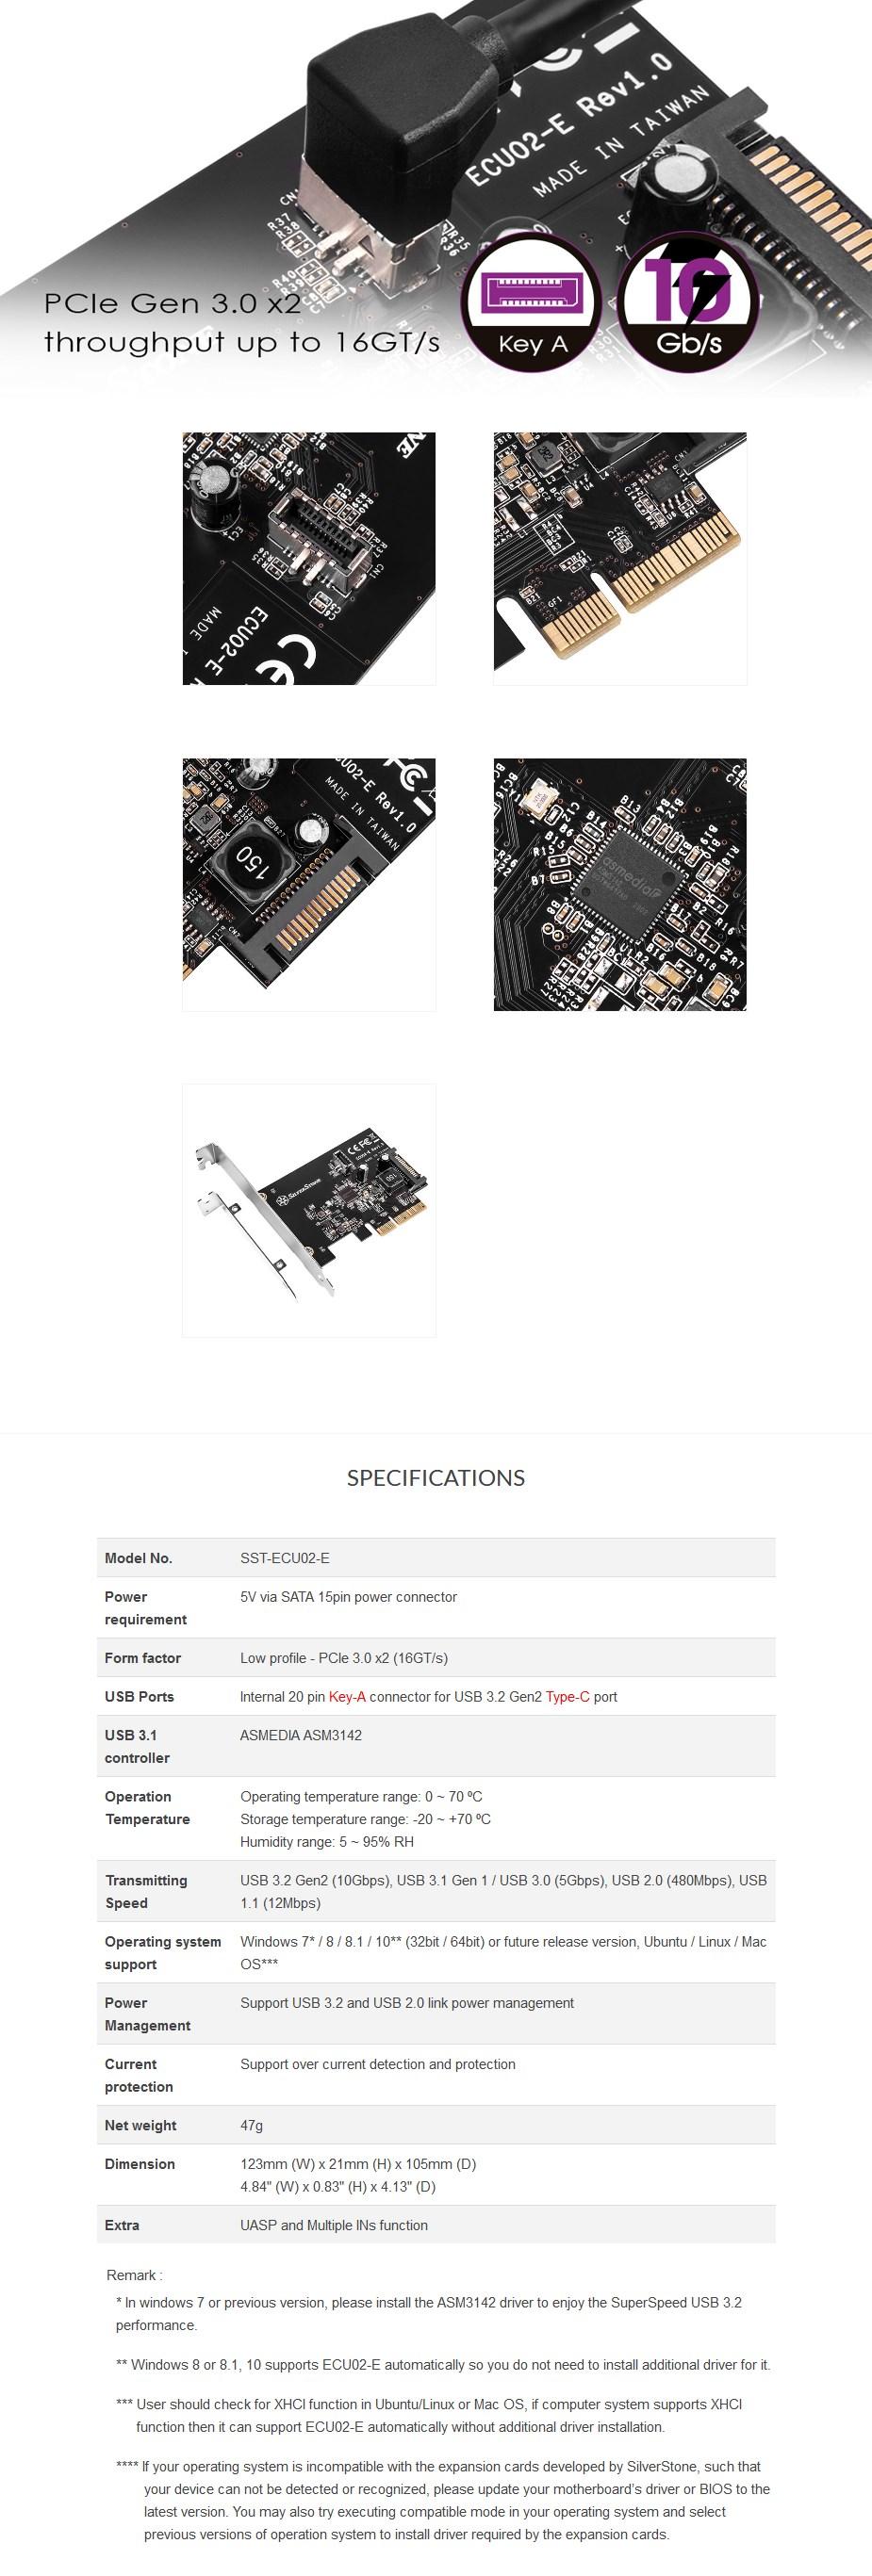 SilverStone SST-ECU02-E USB 3.1 Gen 2 Internal Expansion Card - Overview 1